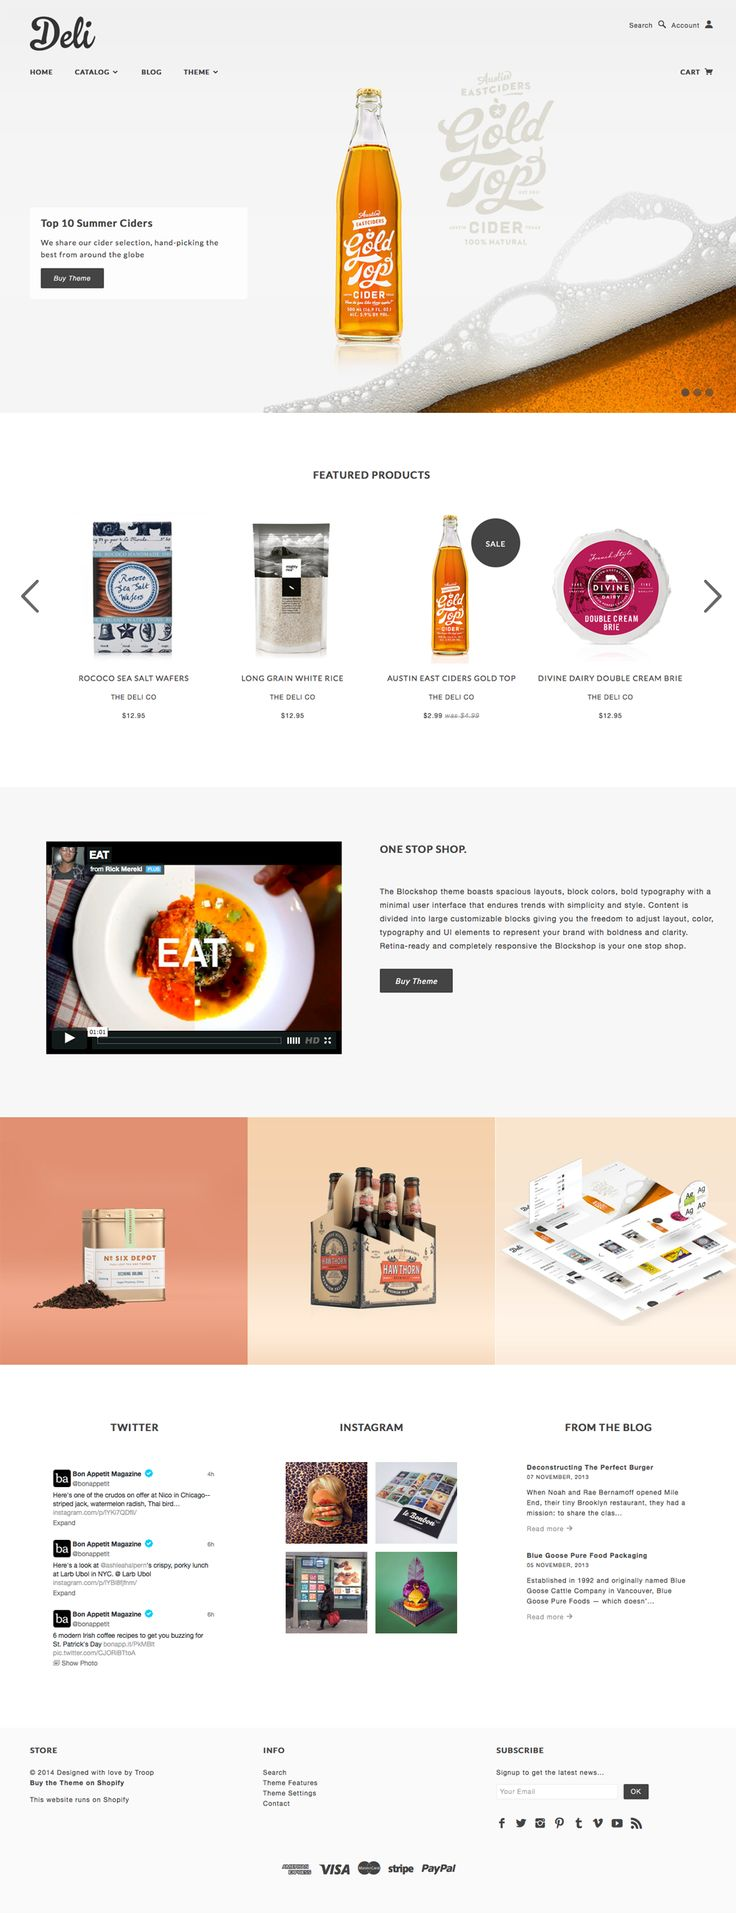 Blockshop | #webdesign #it #web #design #layout #userinterface #website #webdesign < repinned by www.BlickeDeeler.de | Visit our website www.blickedeeler.de/leistungen/webdesign